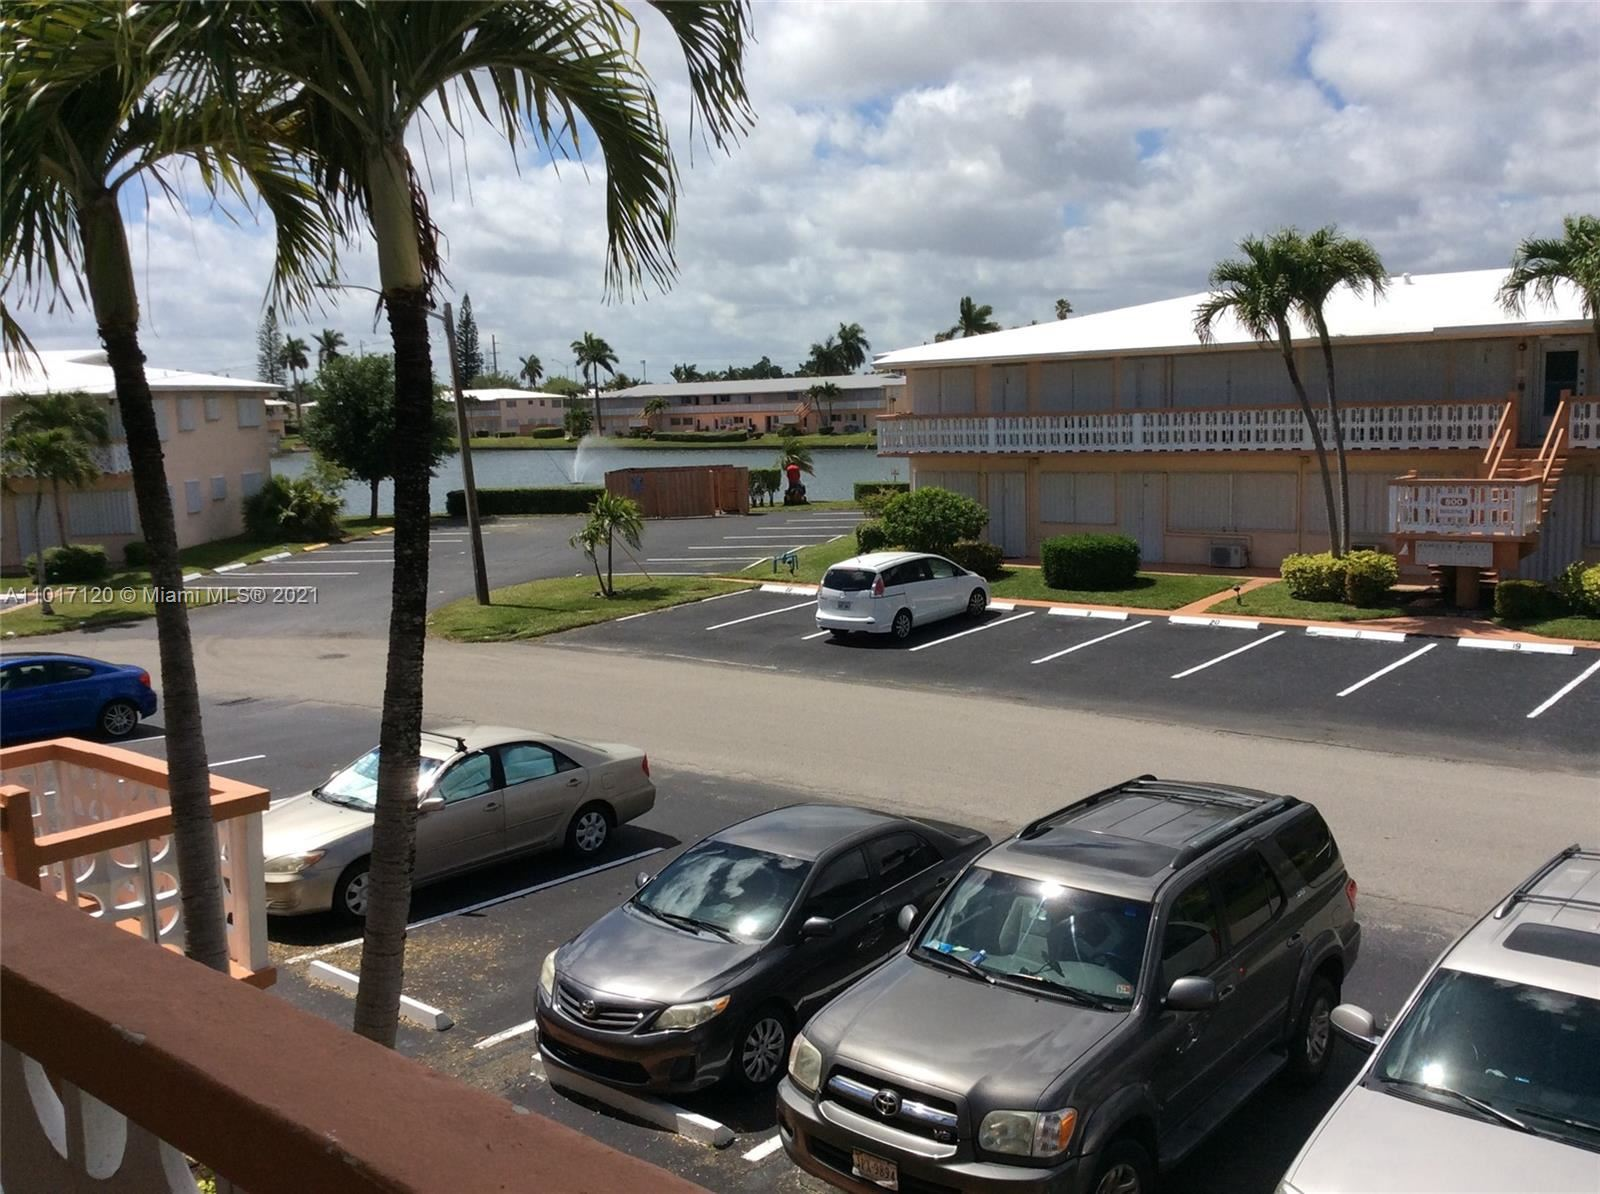 815 SW 10th Ter #17V, Hallandale Beach, FL 33009 - #: A11017120